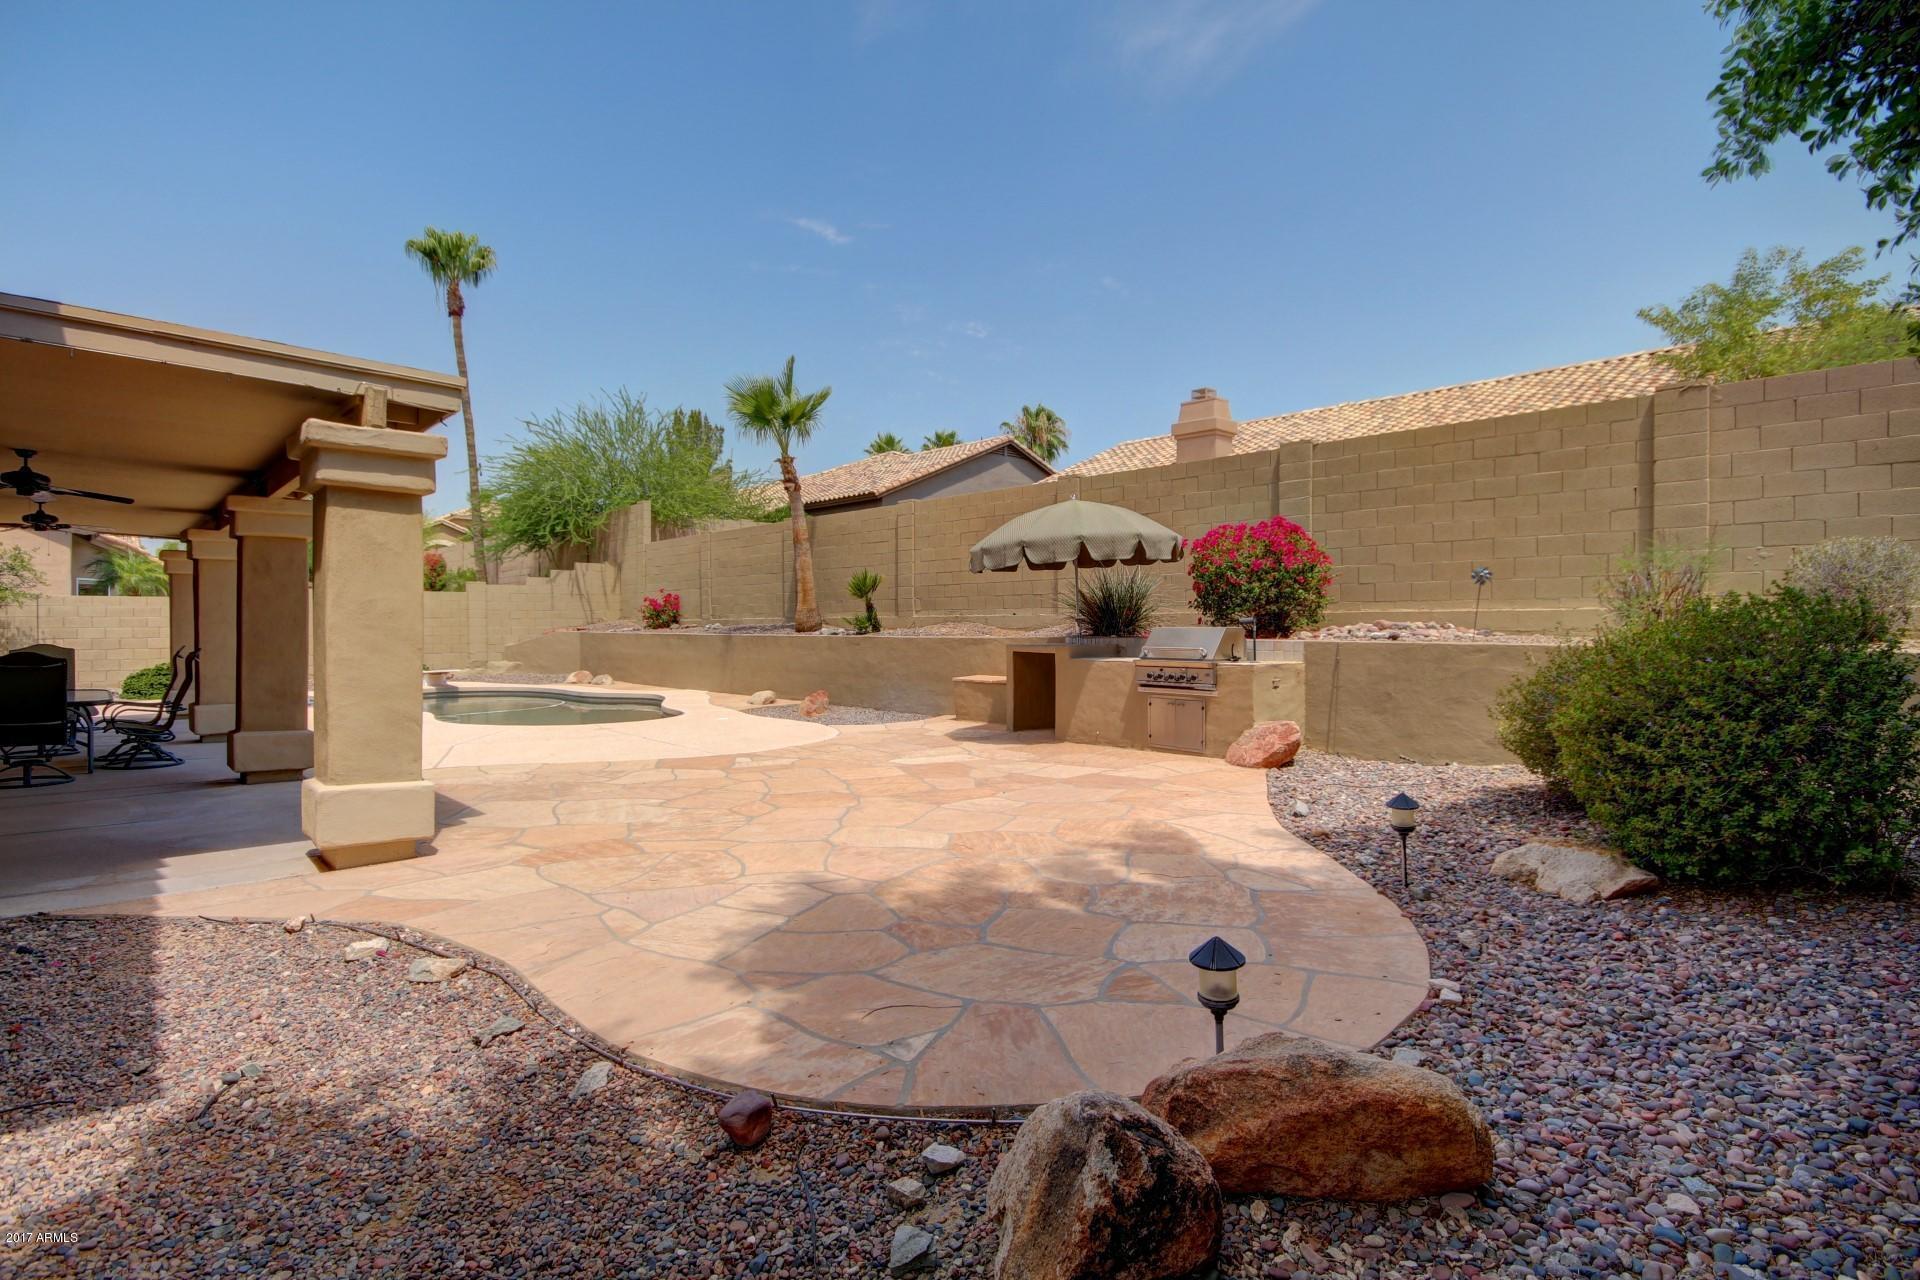 MLS 5622242 2028 E CATHEDRAL ROCK Drive, Phoenix, AZ 85048 Phoenix AZ Mountain Park Ranch